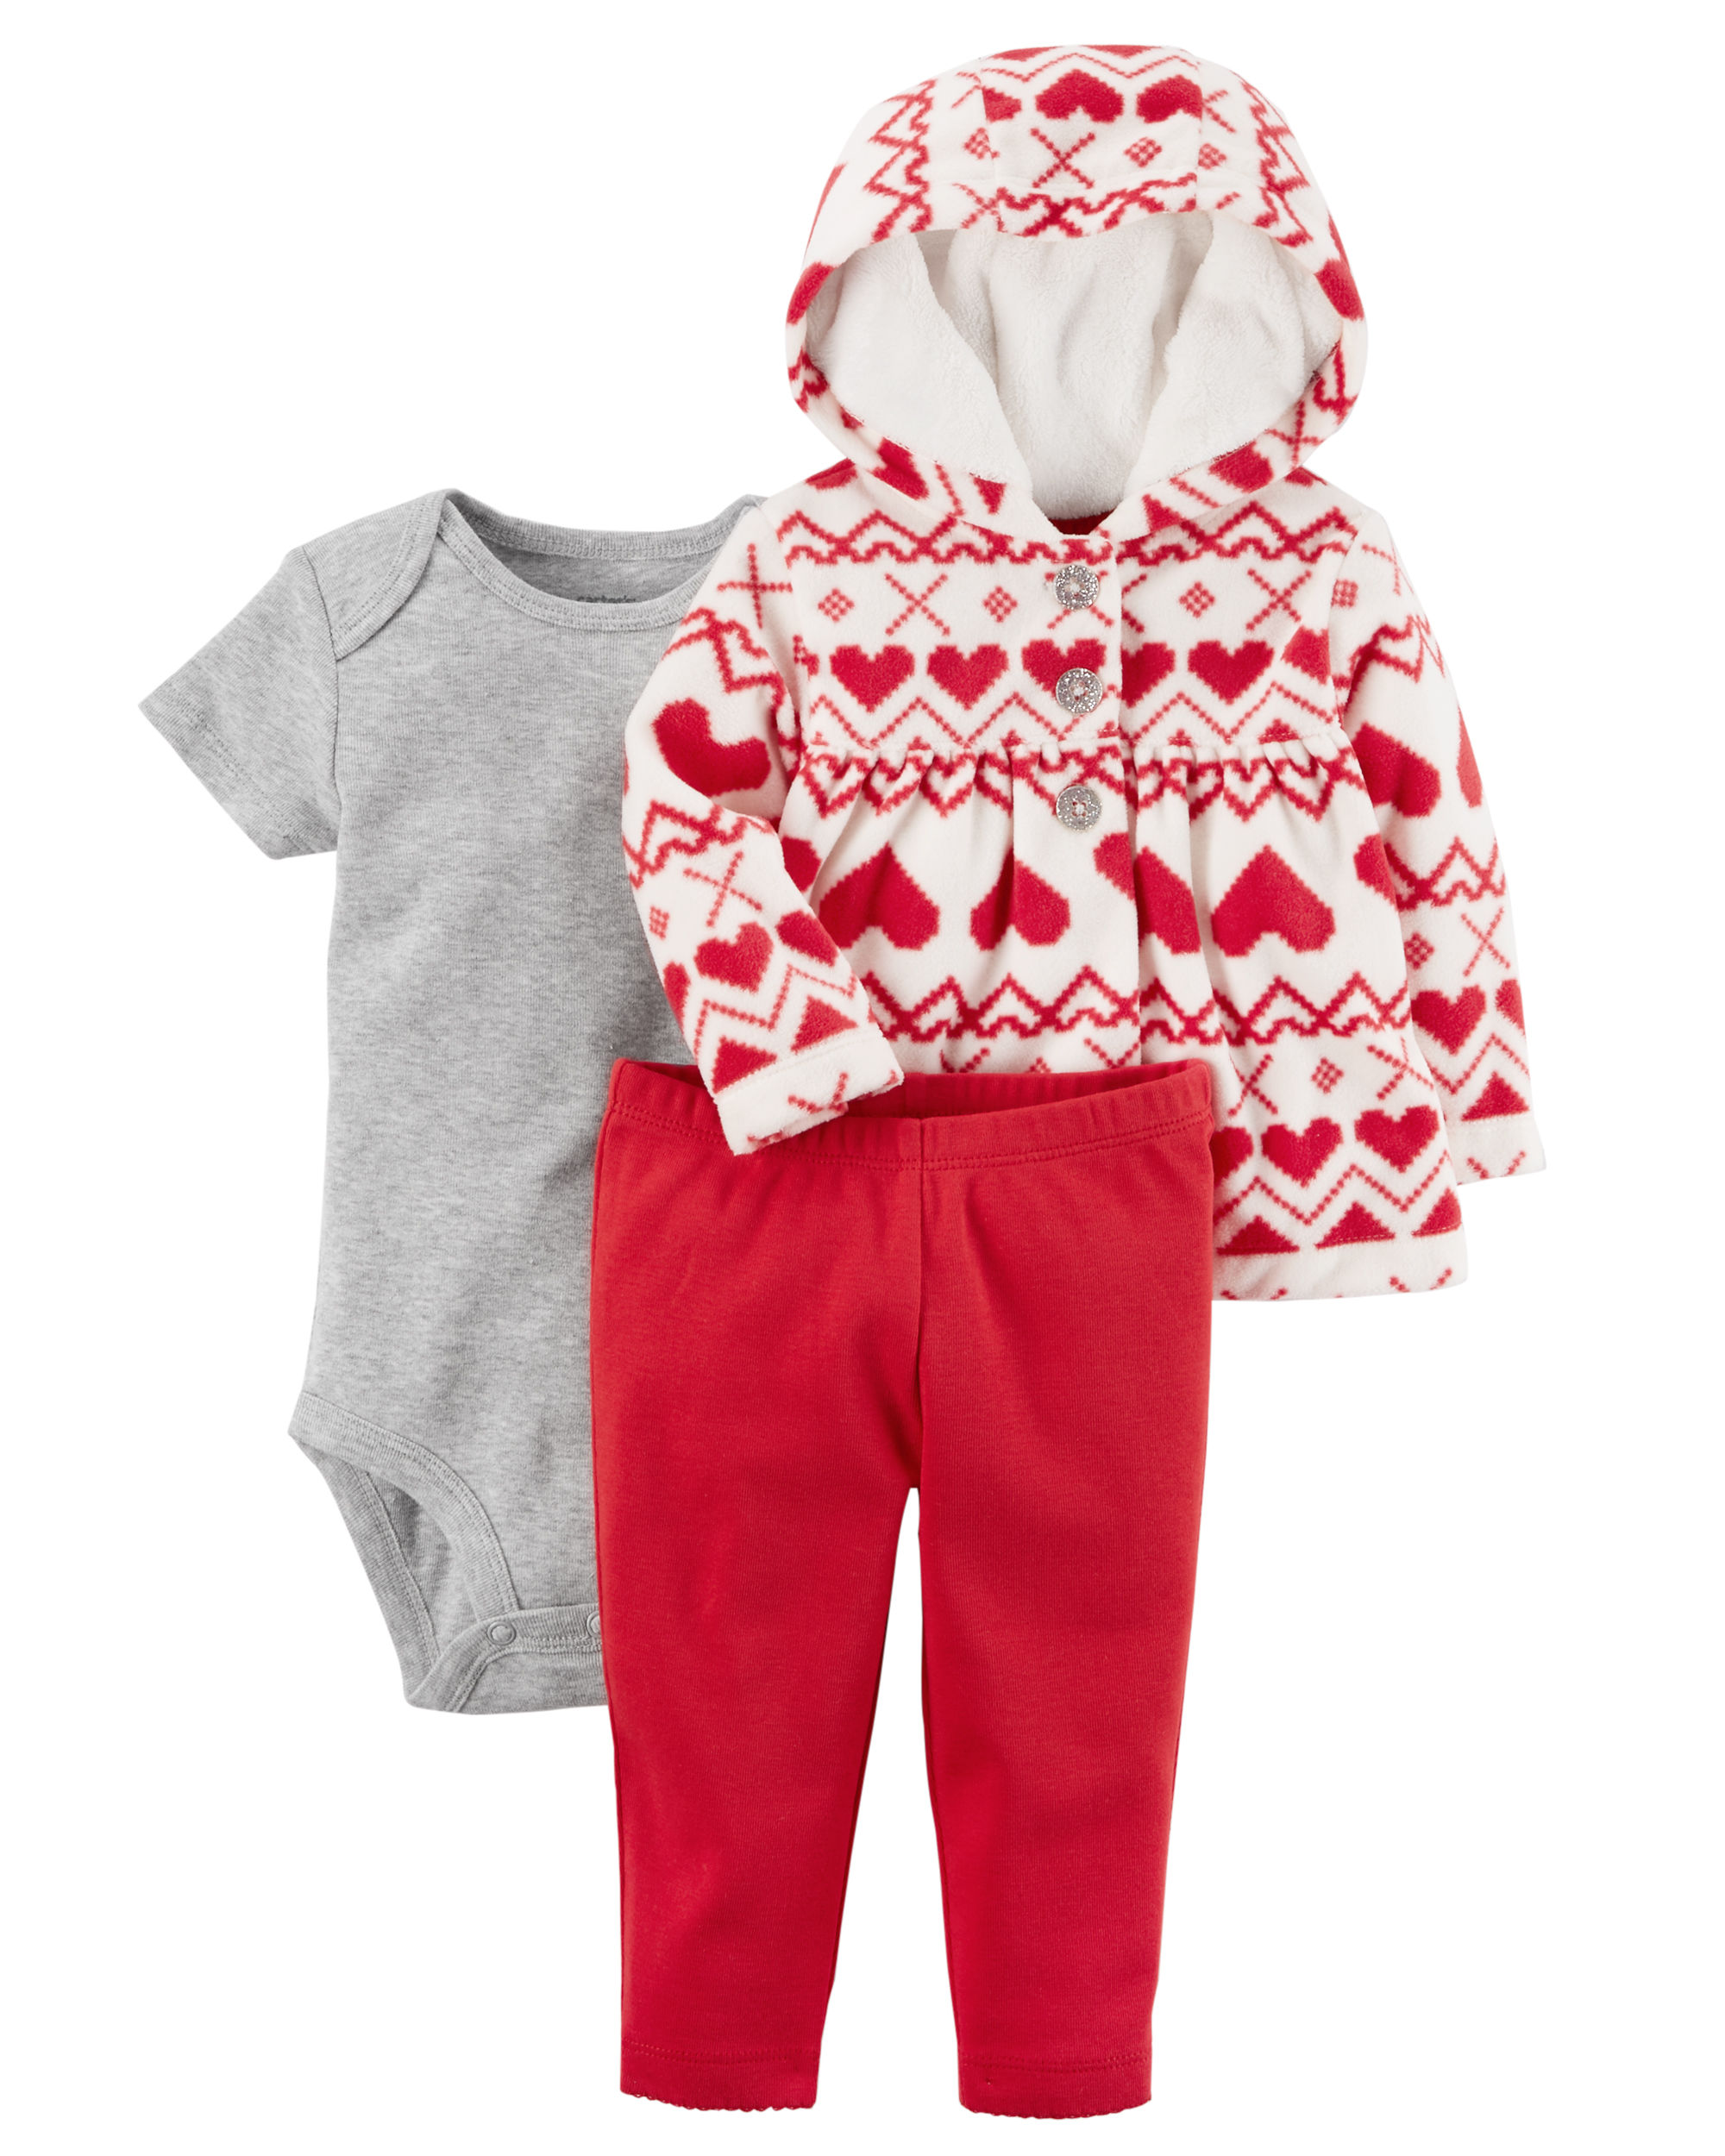 c4c0f661f Carter s Baby Girls  3 Piece Heart Print Little Jacket Set